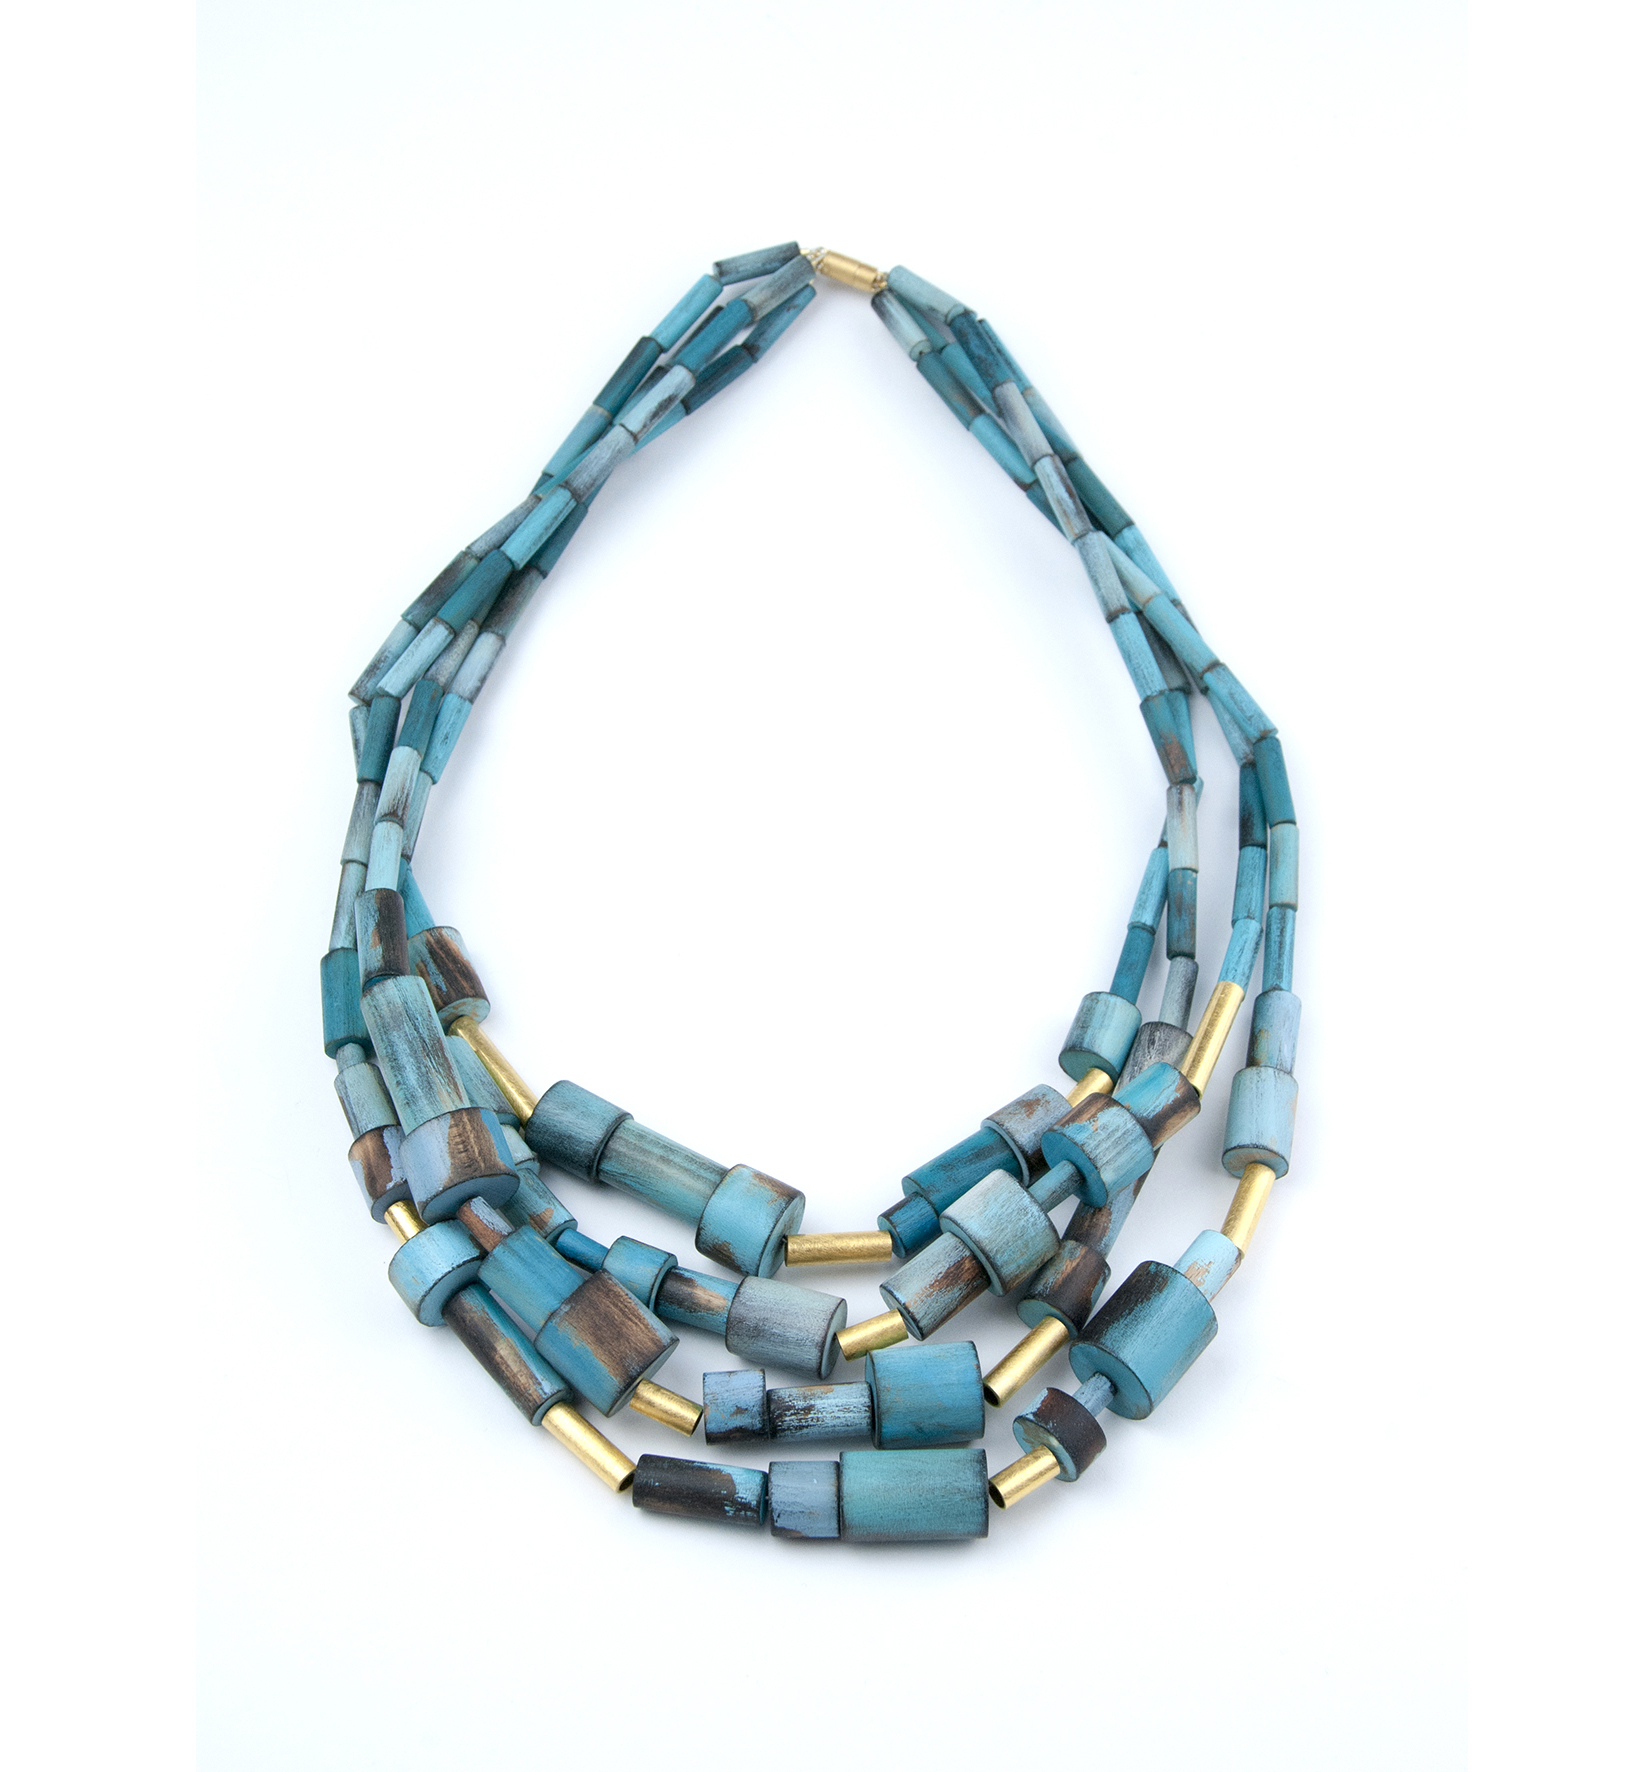 Cristina Zani Work My Seoul gold and turquoises necklace.jpg